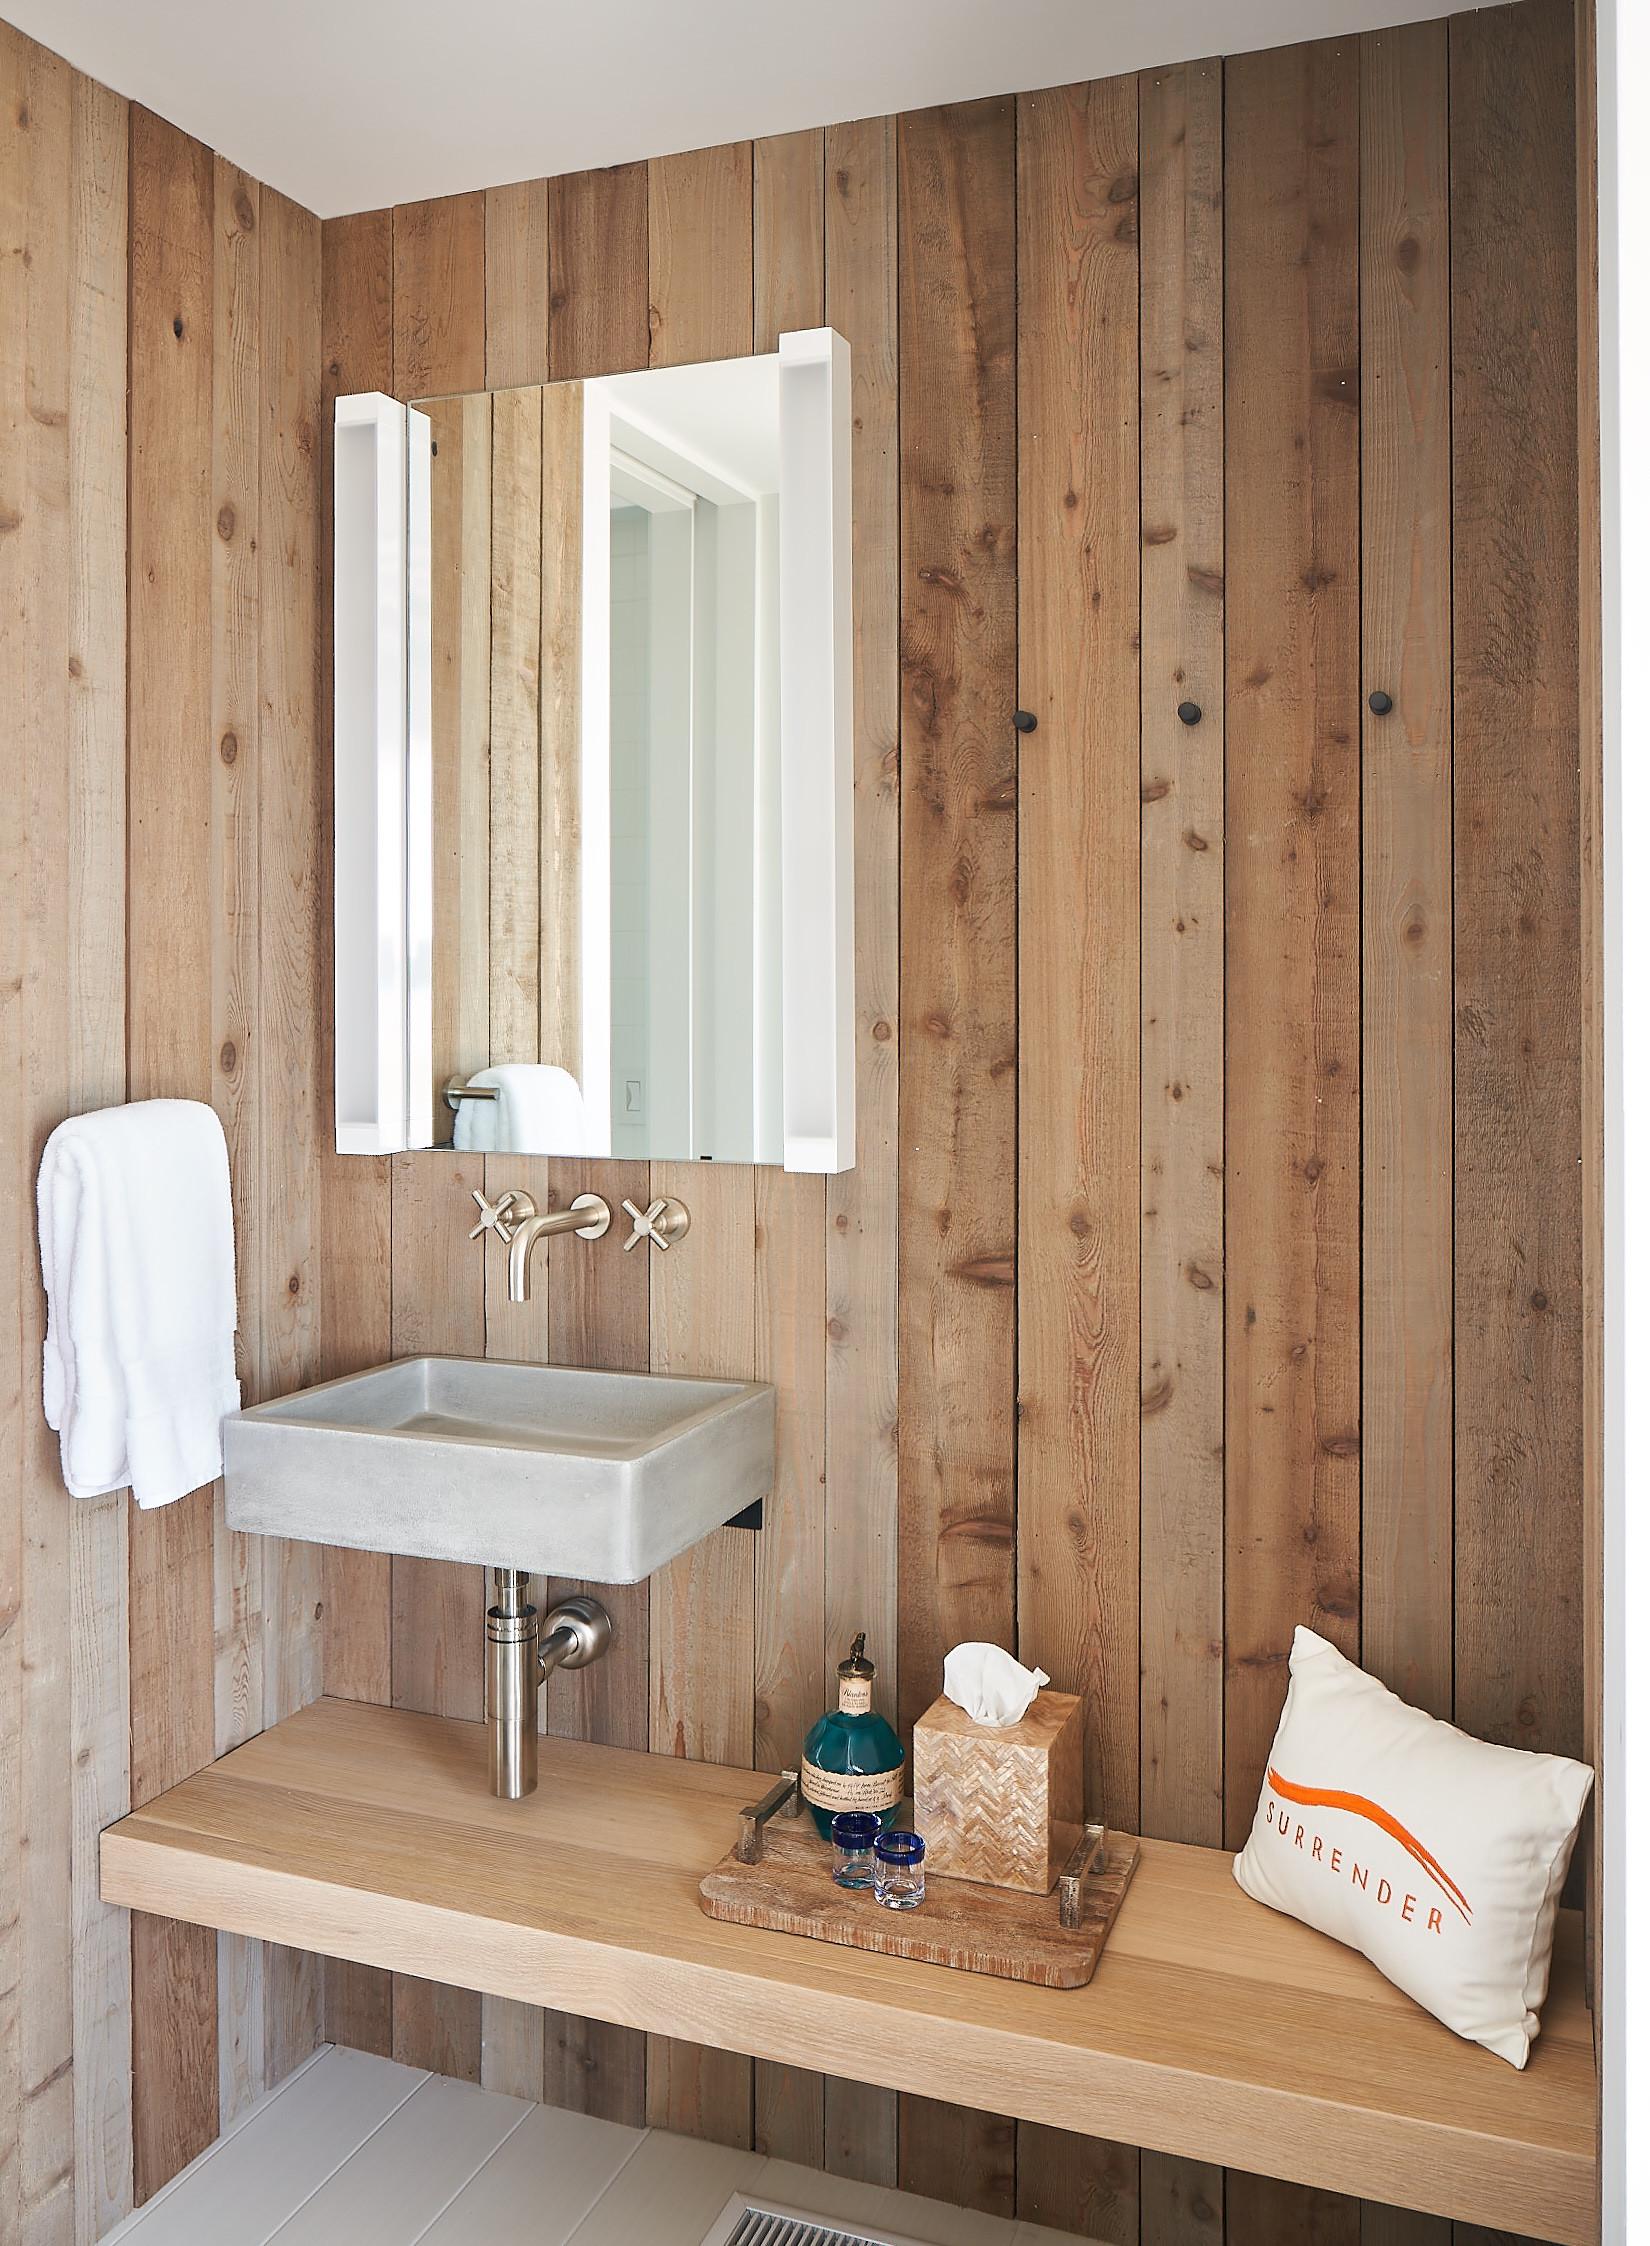 75 Beautiful Bathroom Pictures Ideas February 2021 Houzz